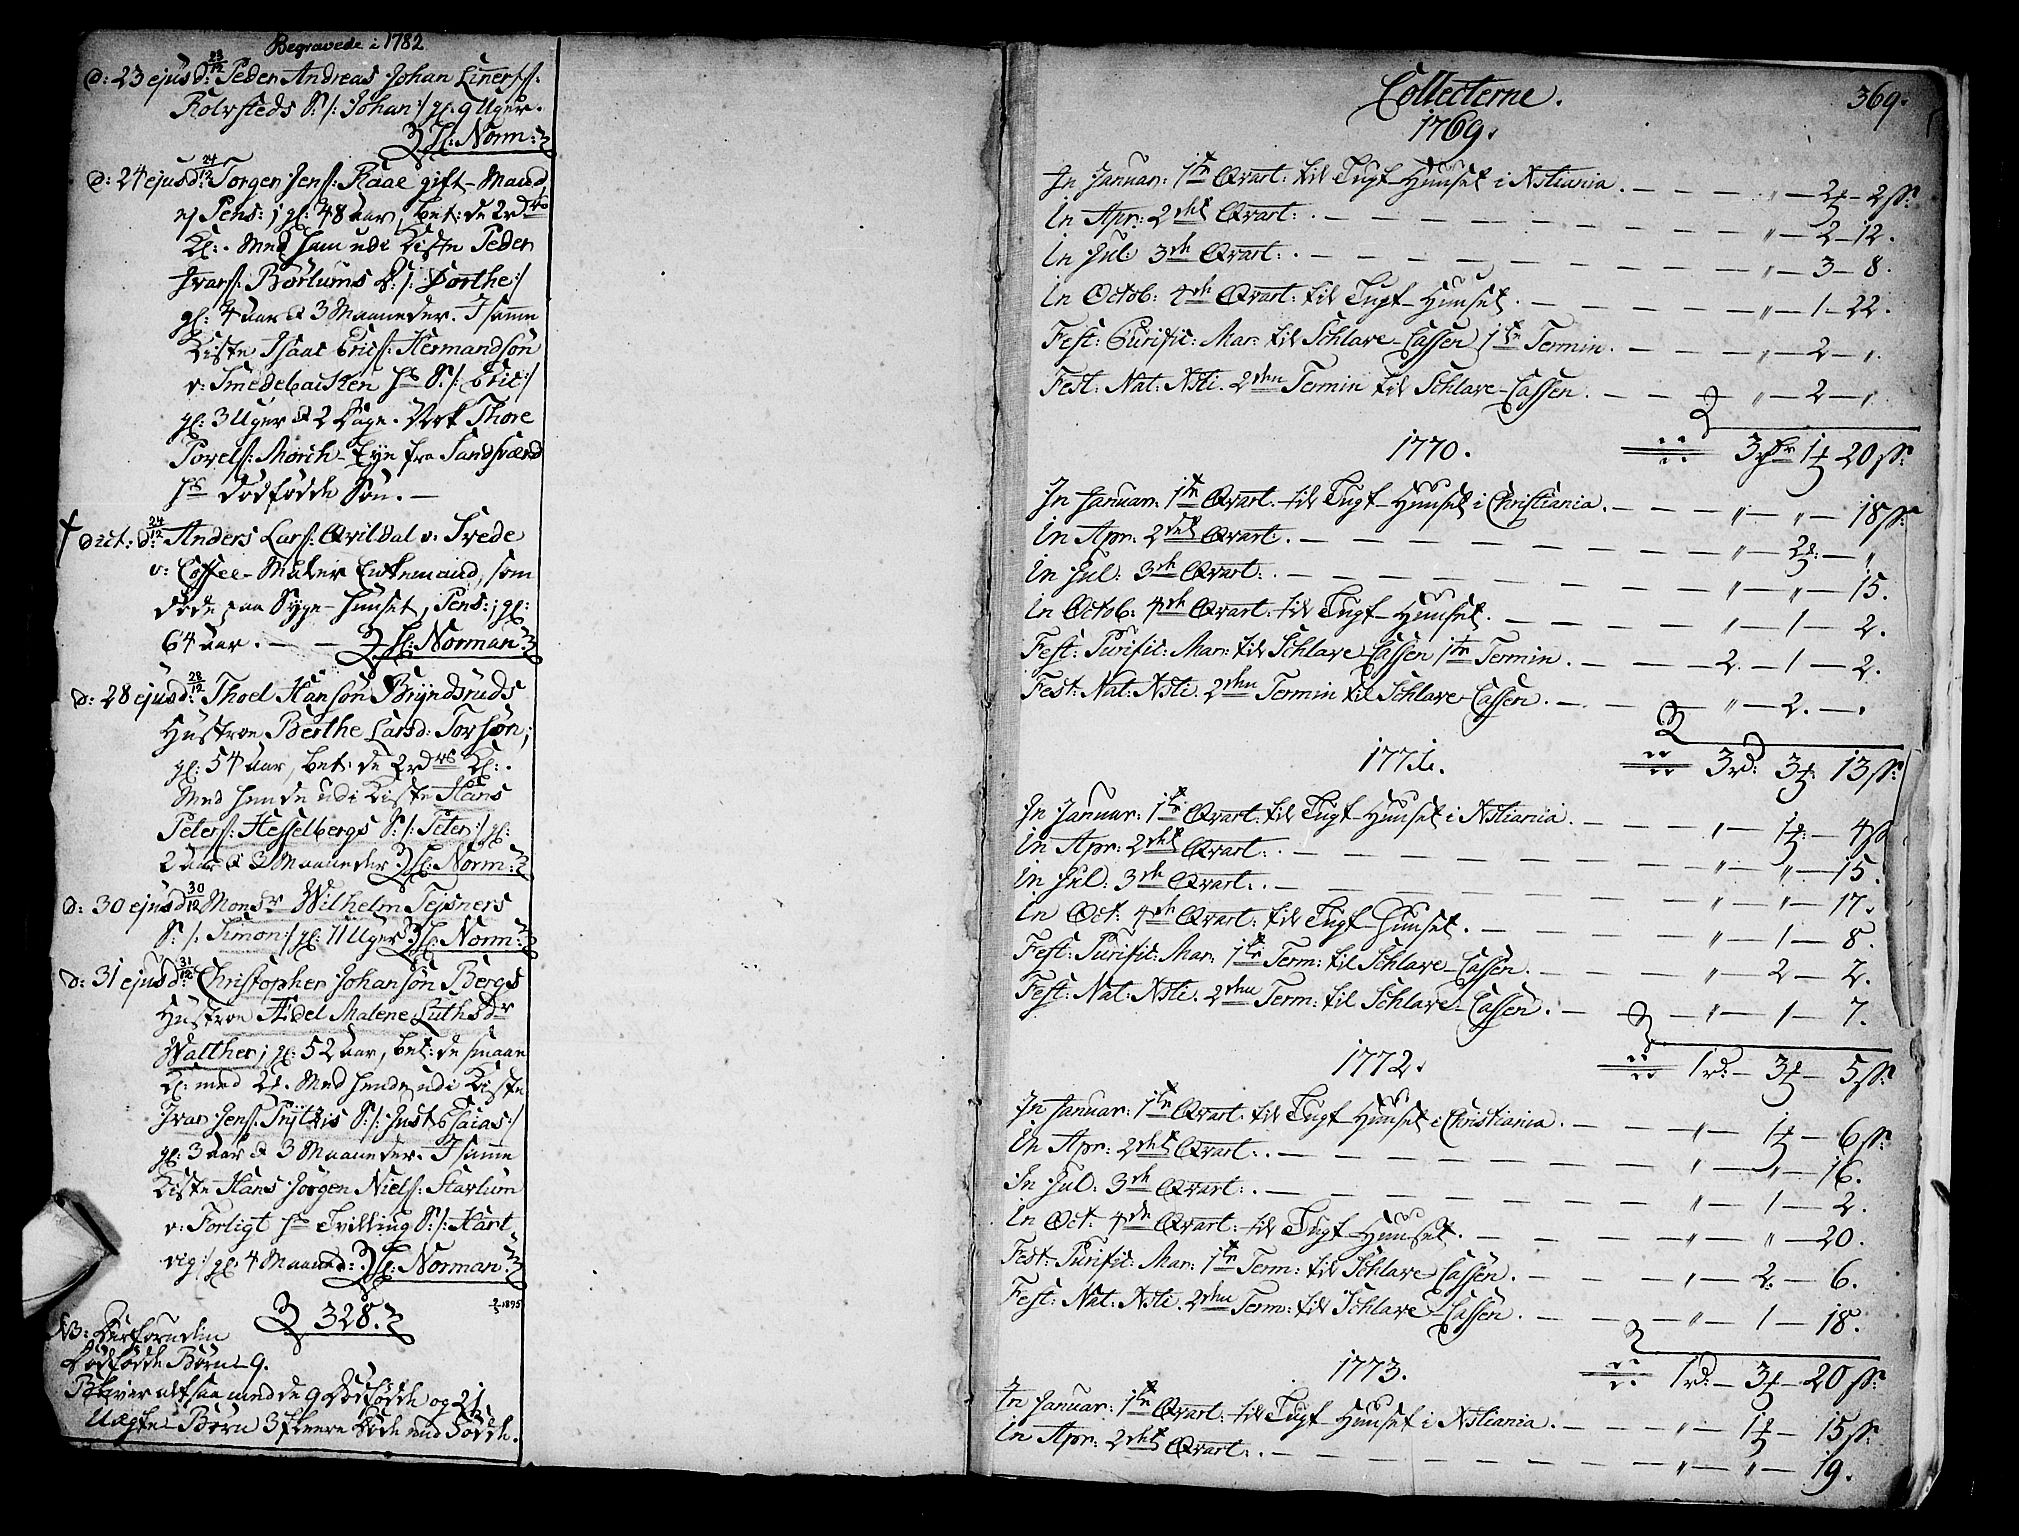 SAKO, Kongsberg kirkebøker, F/Fa/L0005: Parish register (official) no. I 5, 1769-1782, p. 369